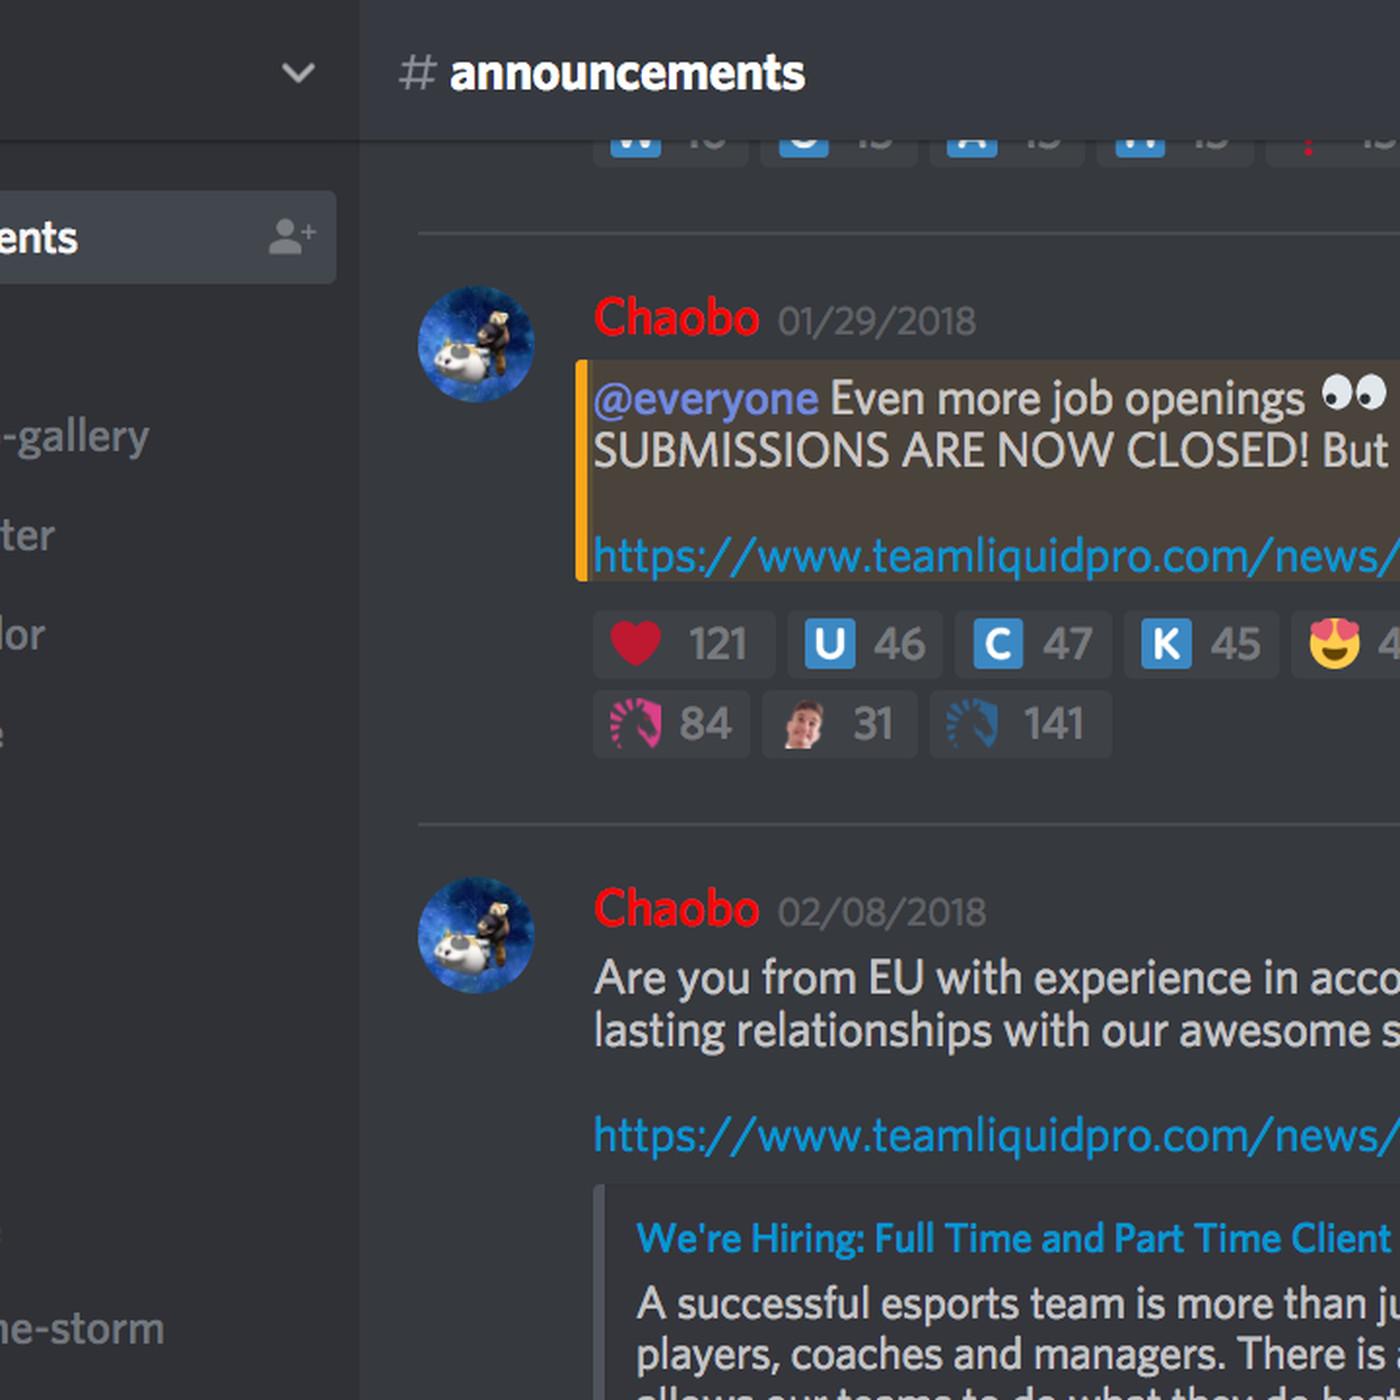 Discord expands its verified servers program to include pro e-sports